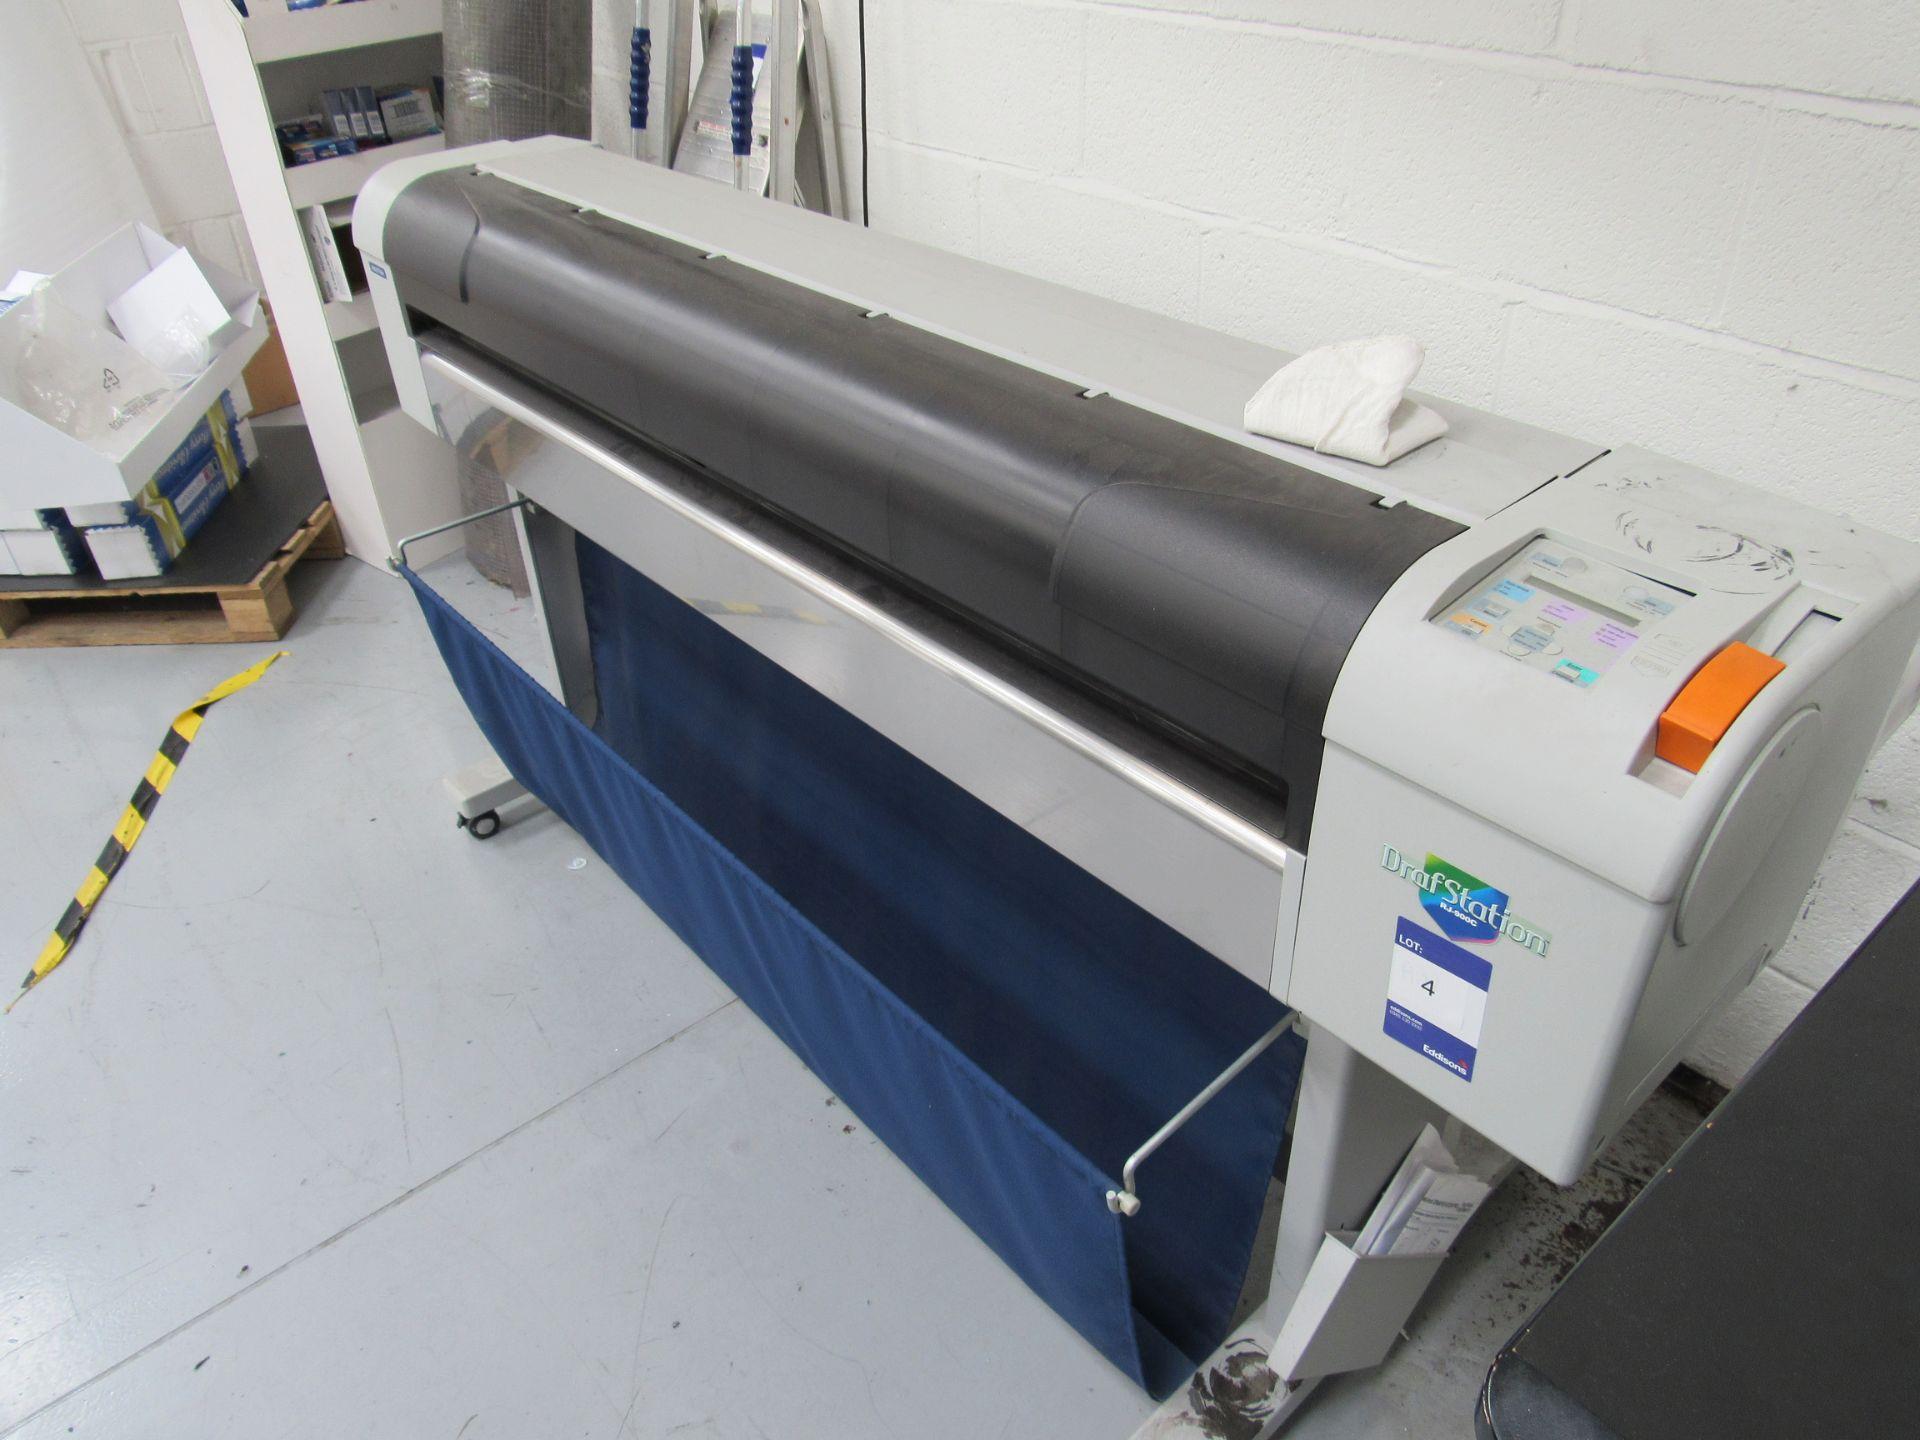 Mlitoh RJ-900C Wide Format Printer 1150mm Serial Number FN4E004886 - Image 2 of 5